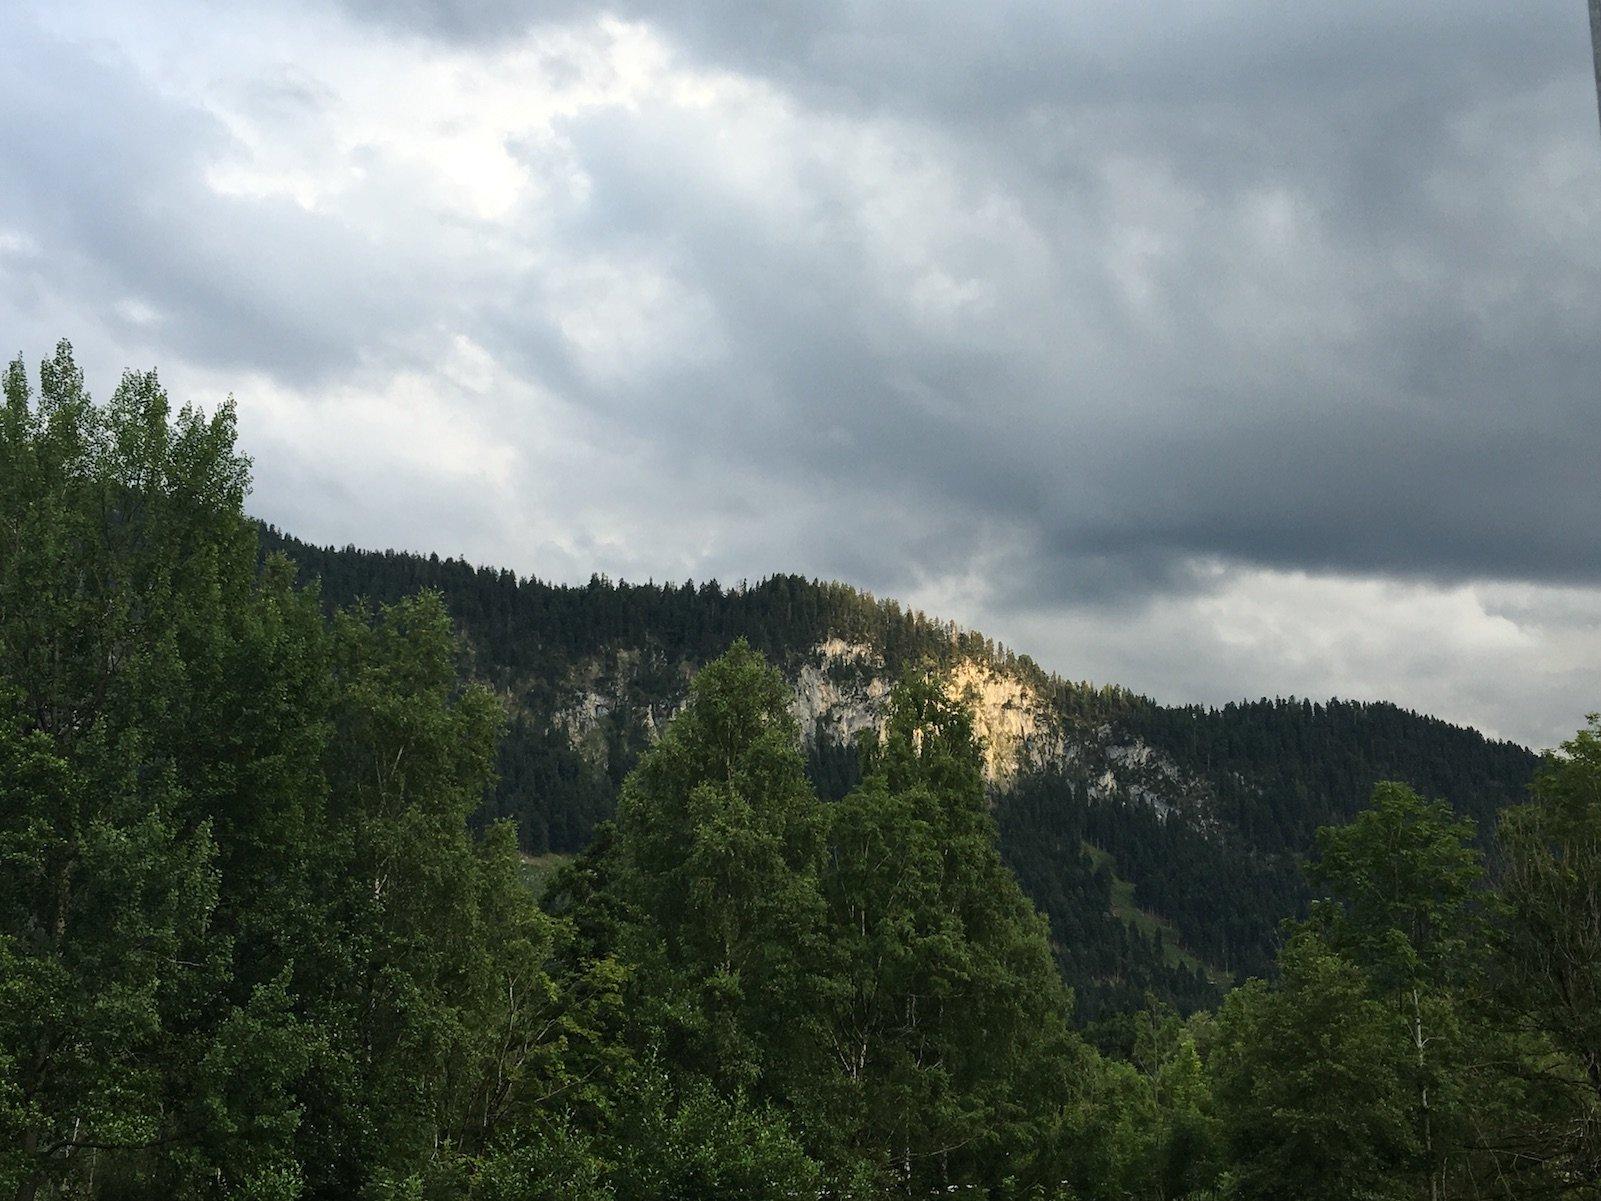 Bewölkter Himmel am nächsten Morgen